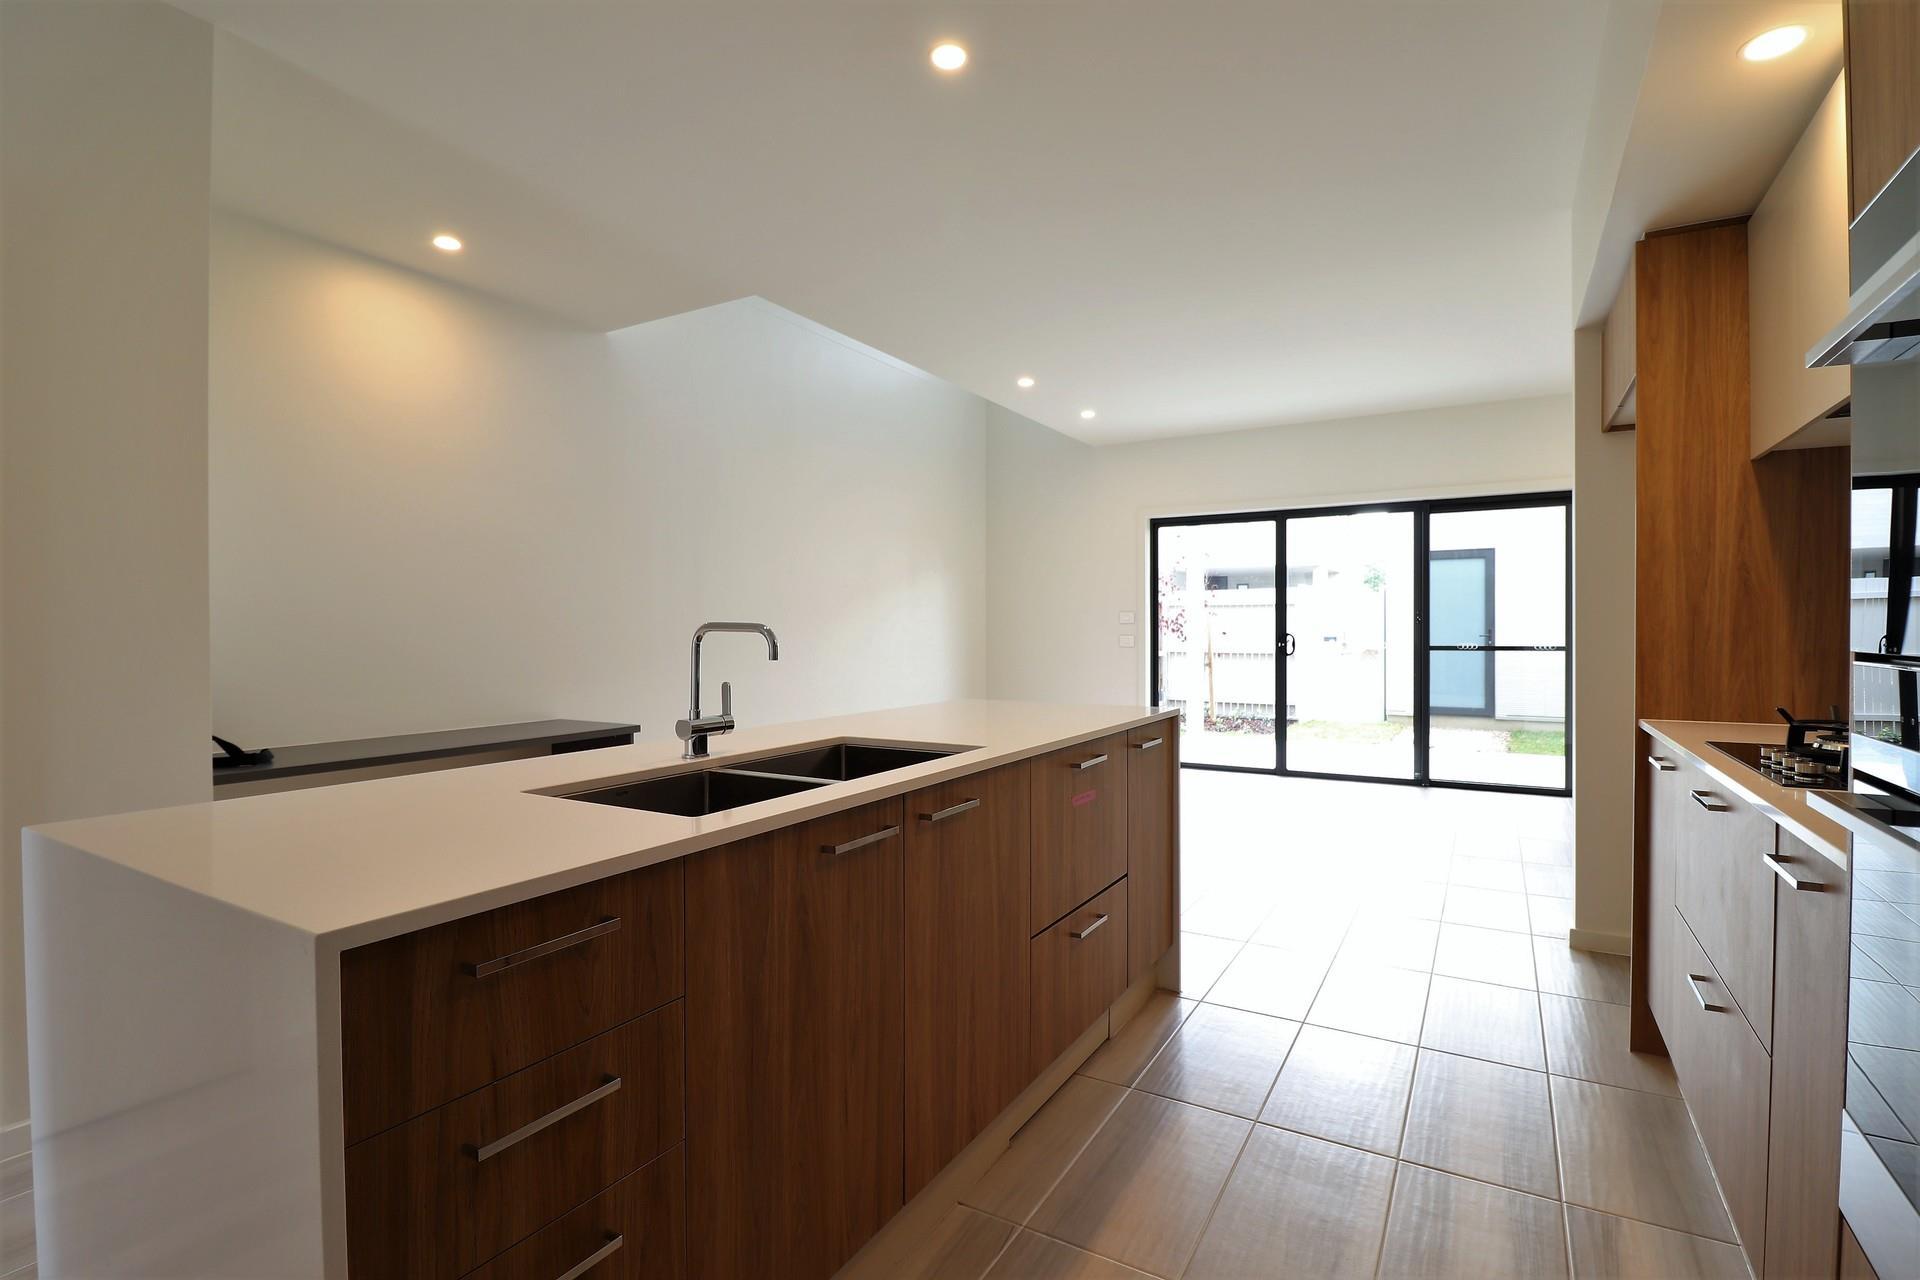 29 Ravenswood St, Gledswood Hills, NSW 2557